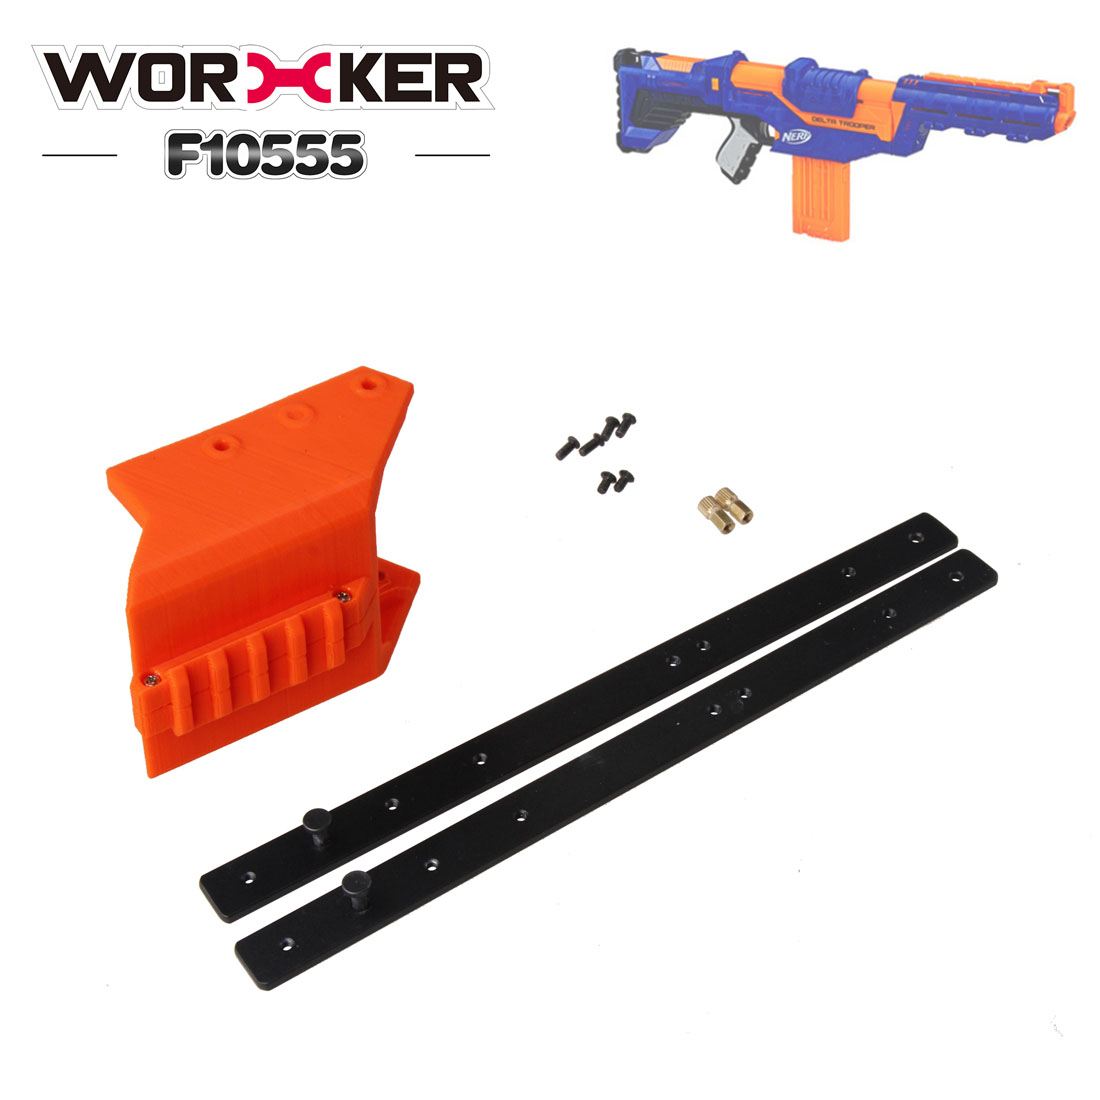 Glow 100pcs 7.2cm Refill Bullet Darts for Nerf N-strike Elite Series toy Gun LS